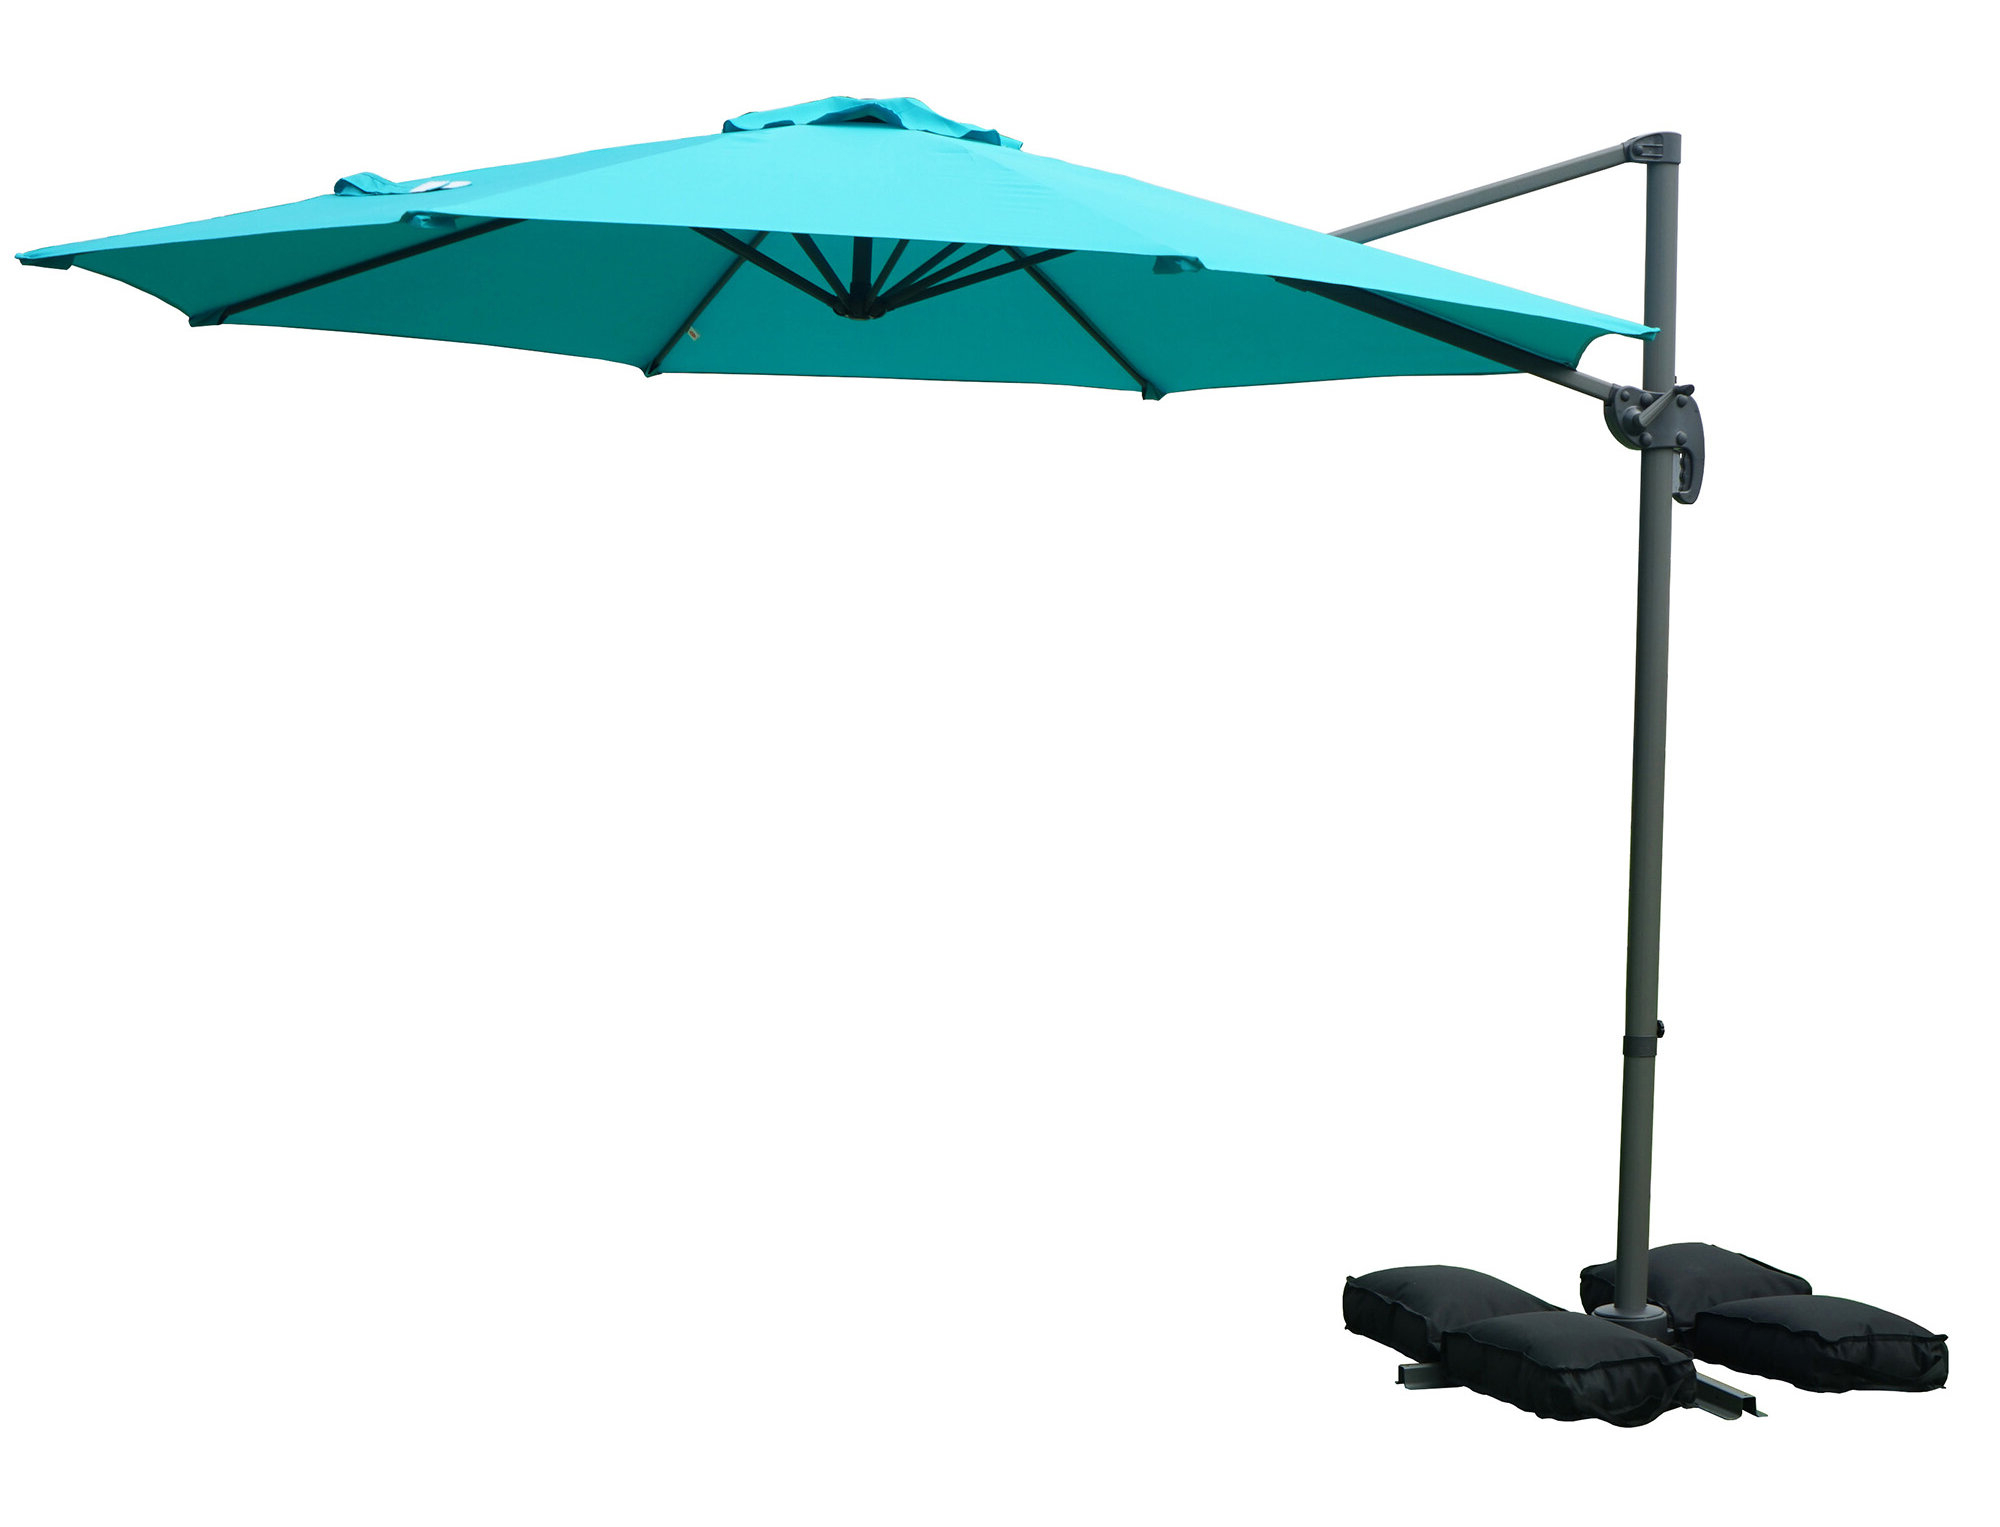 Latest Tottenham Patio Hanging Offset 10' Cantilever Umbrella Pertaining To Tottenham Patio Hanging Offset Cantilever Umbrellas (View 8 of 20)